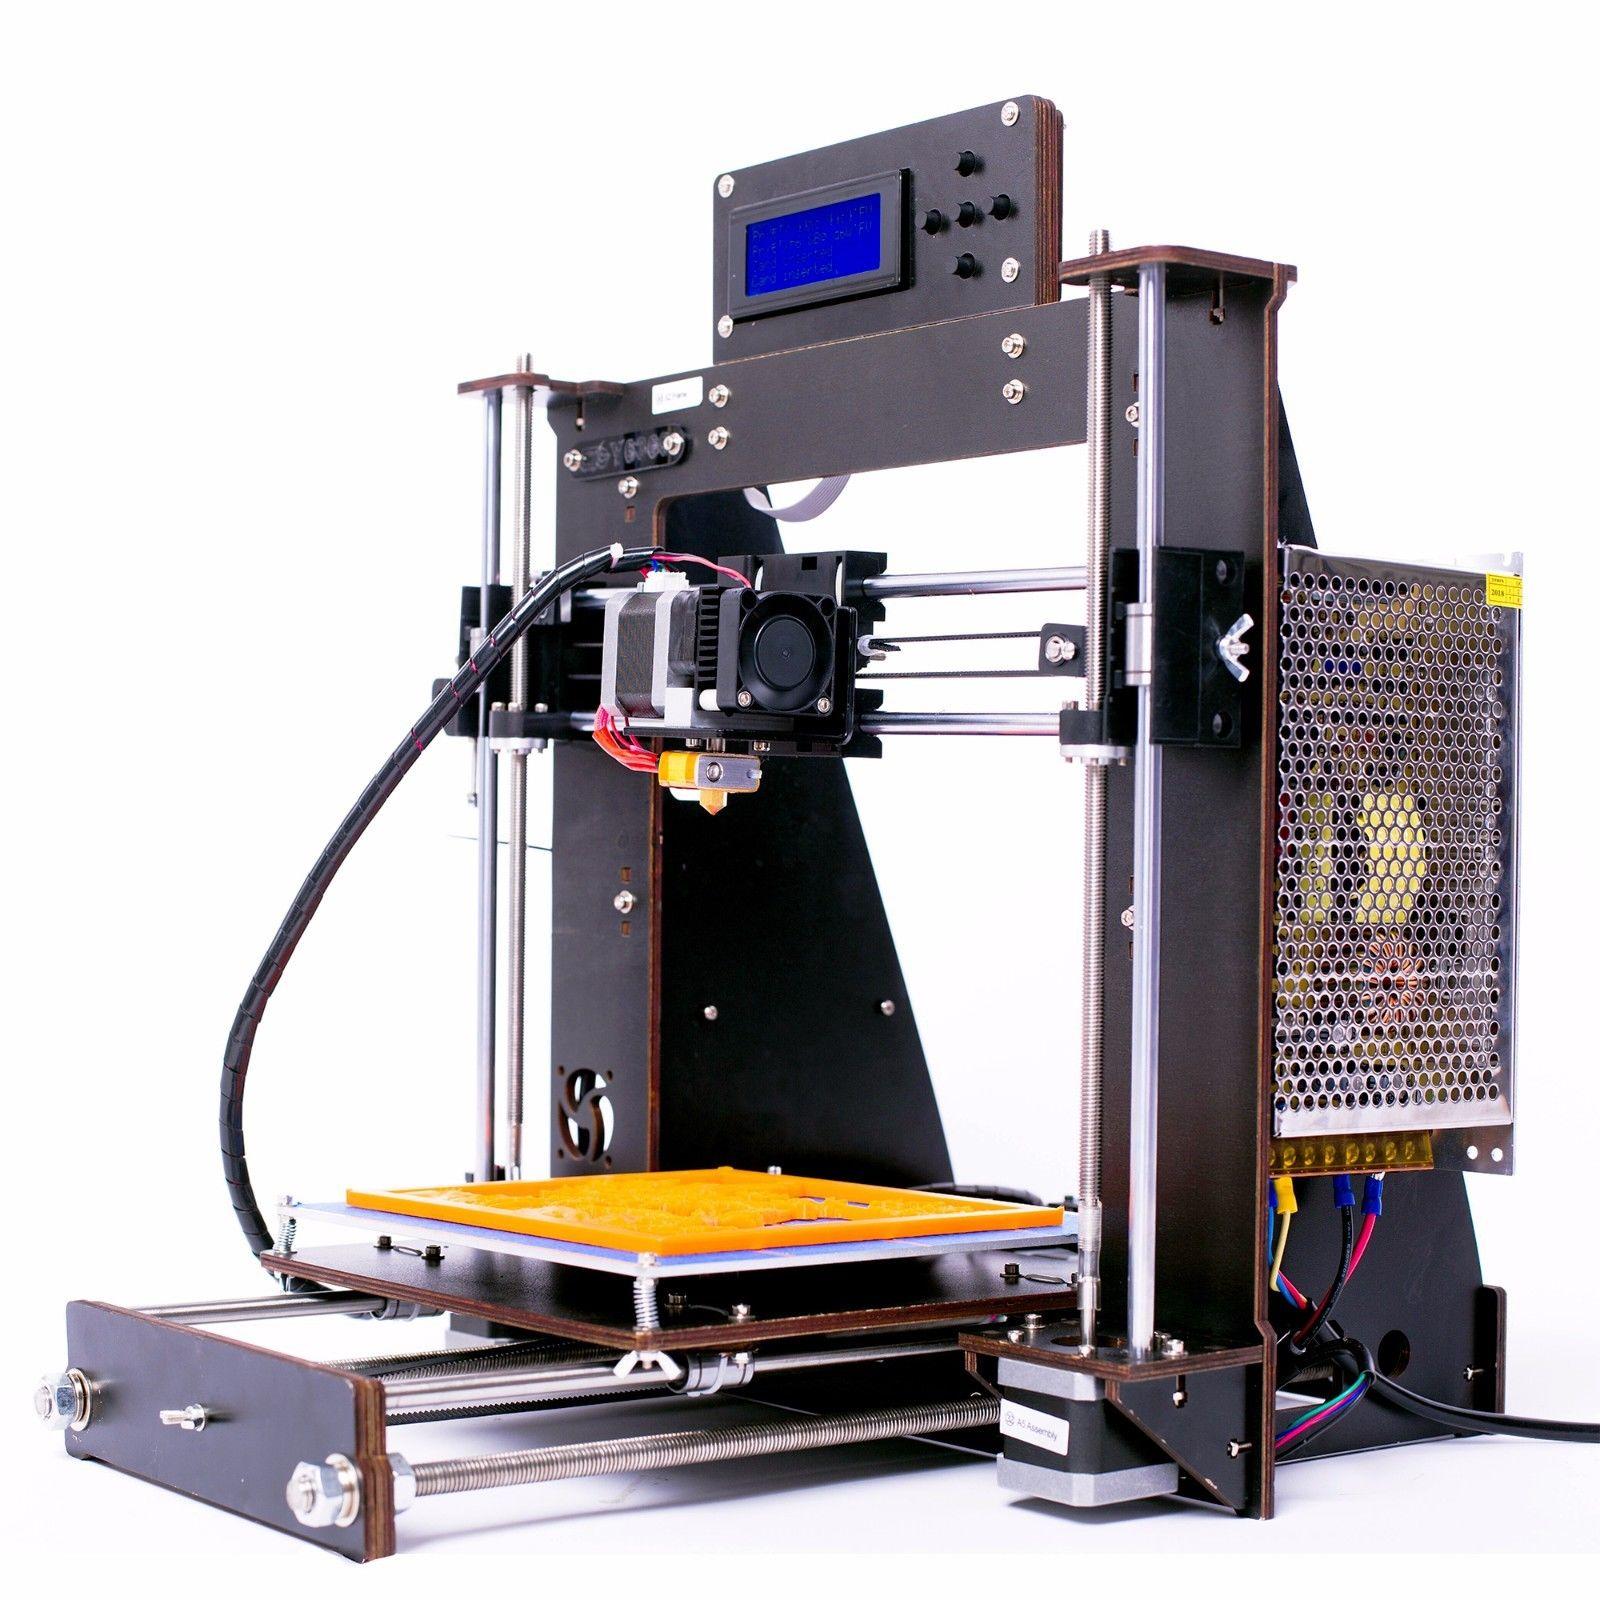 DE Lager 3D Drucker DIY i3 Upgradest Hohe Präzision Reprap Prusa 3d Drucker Stromausfall Lebenslauf Druck